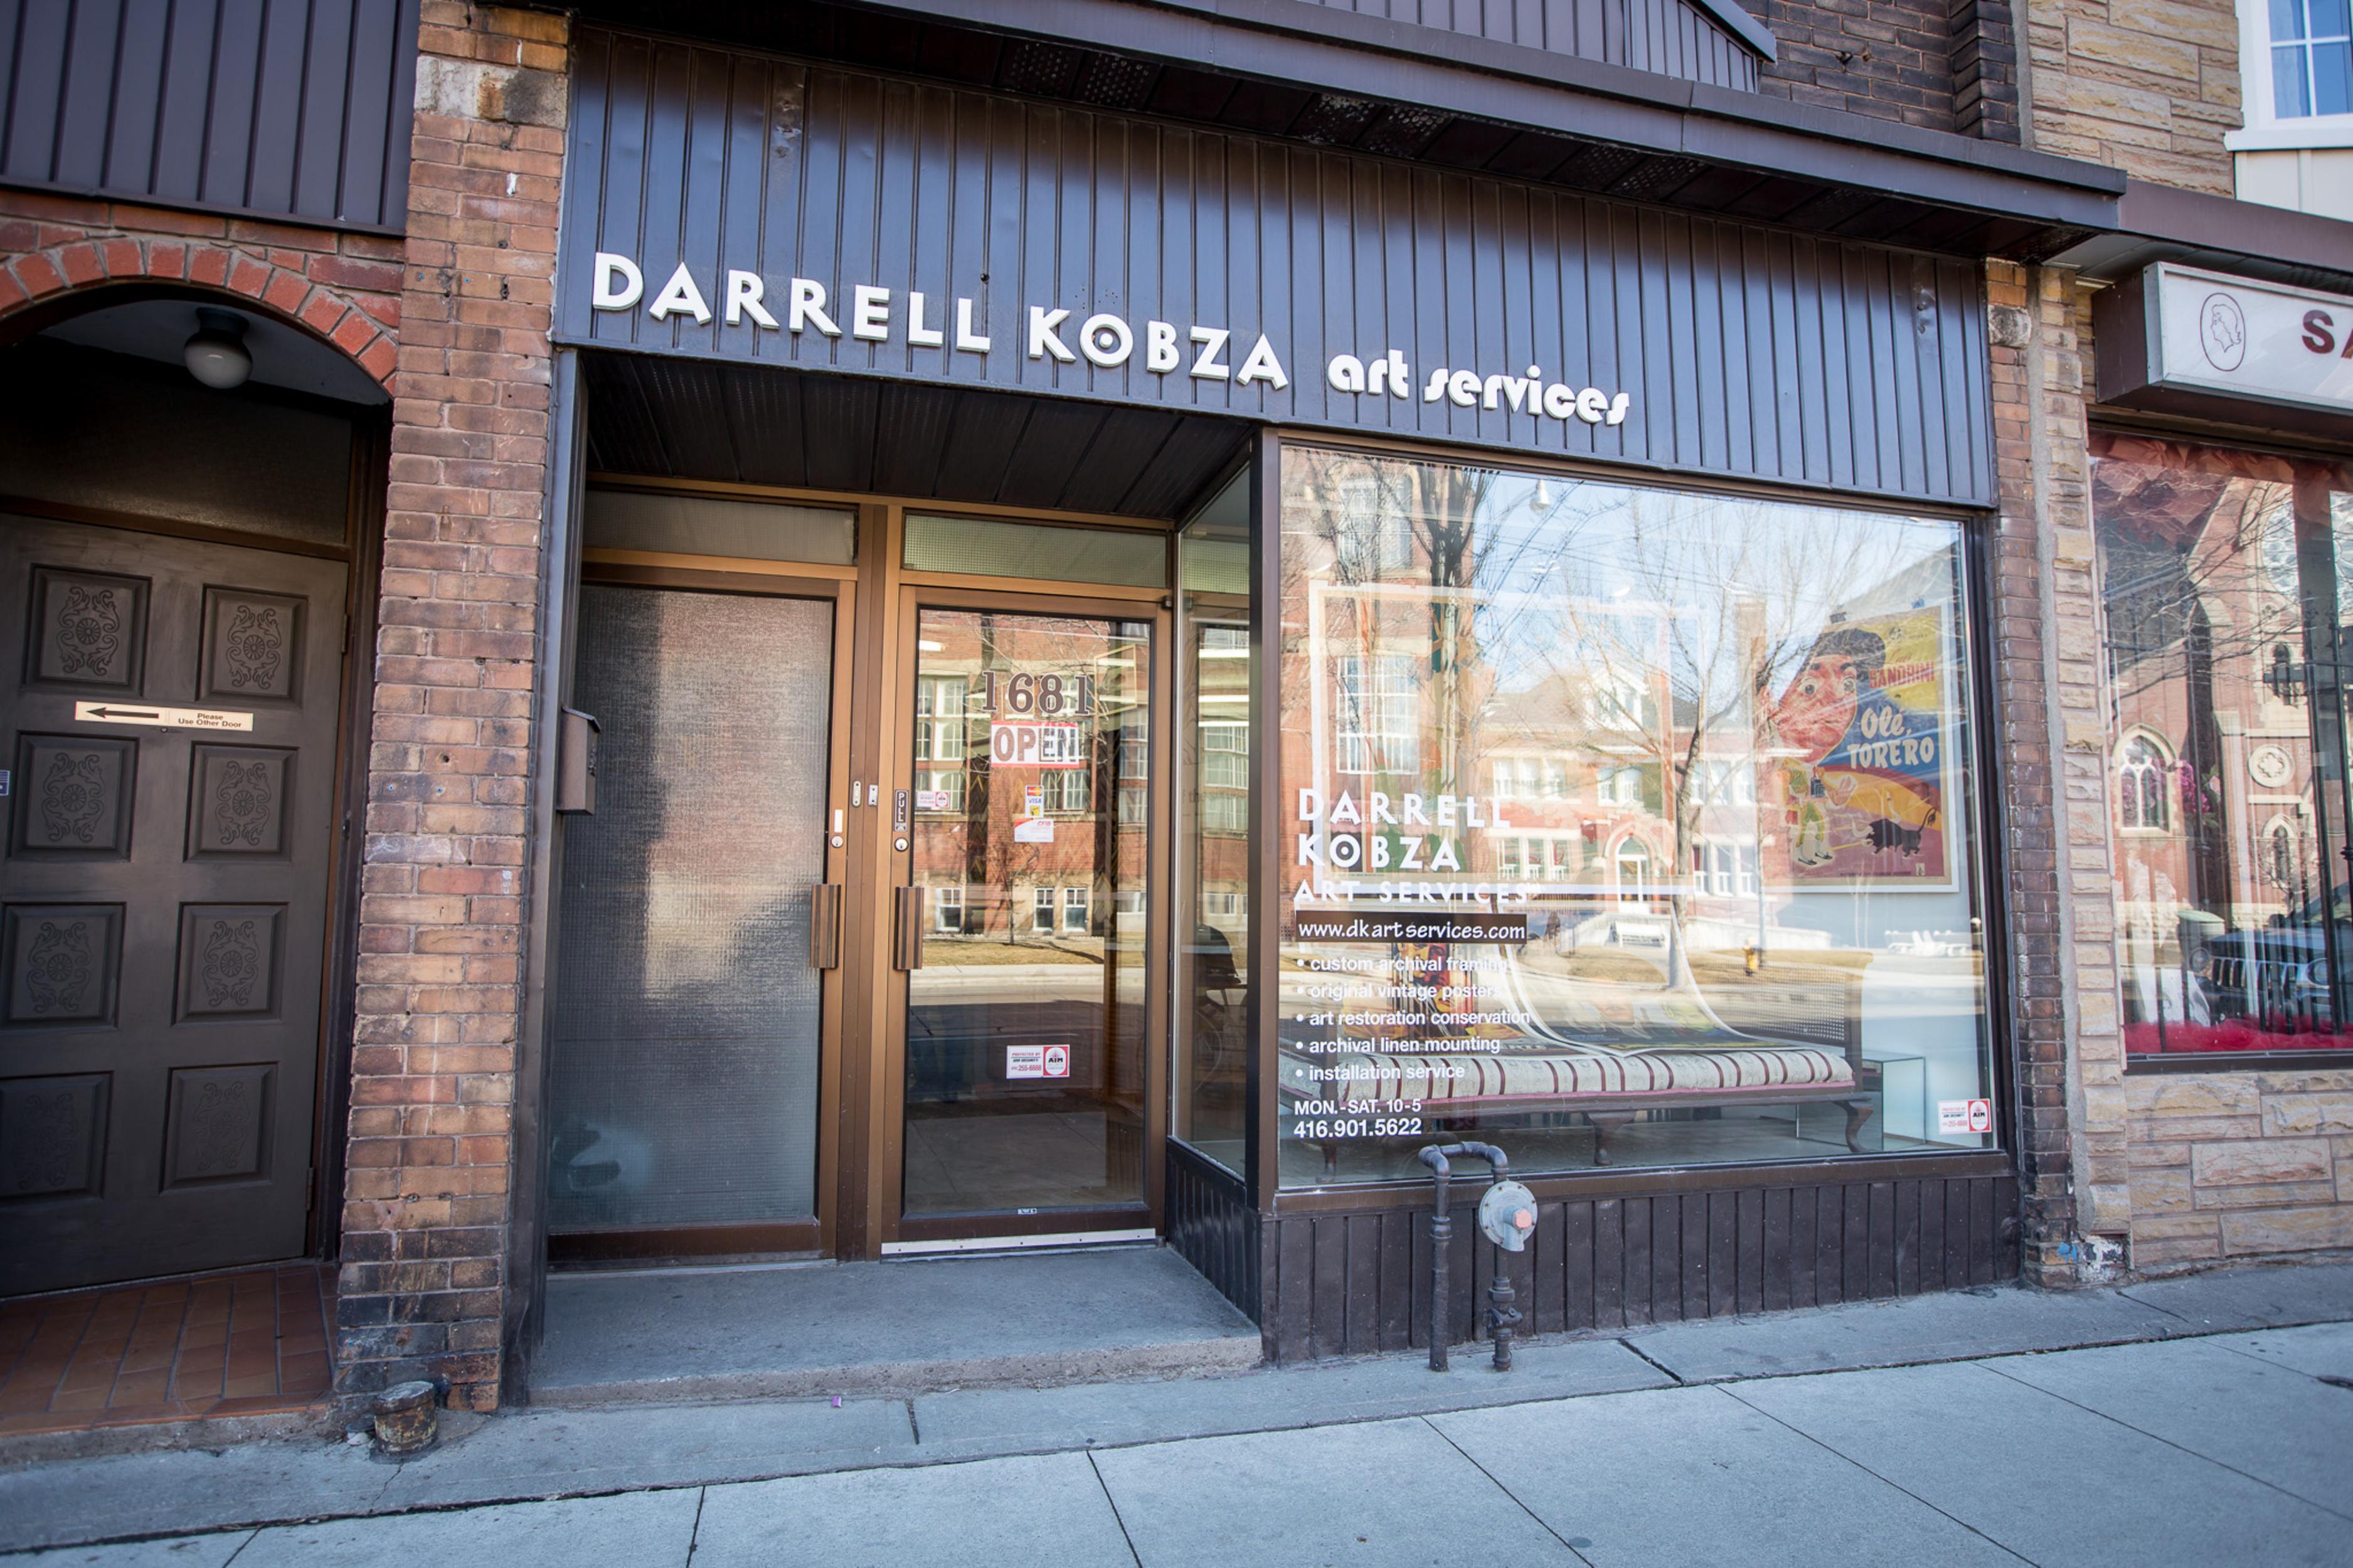 Darrell Kobza Art Services Toronto